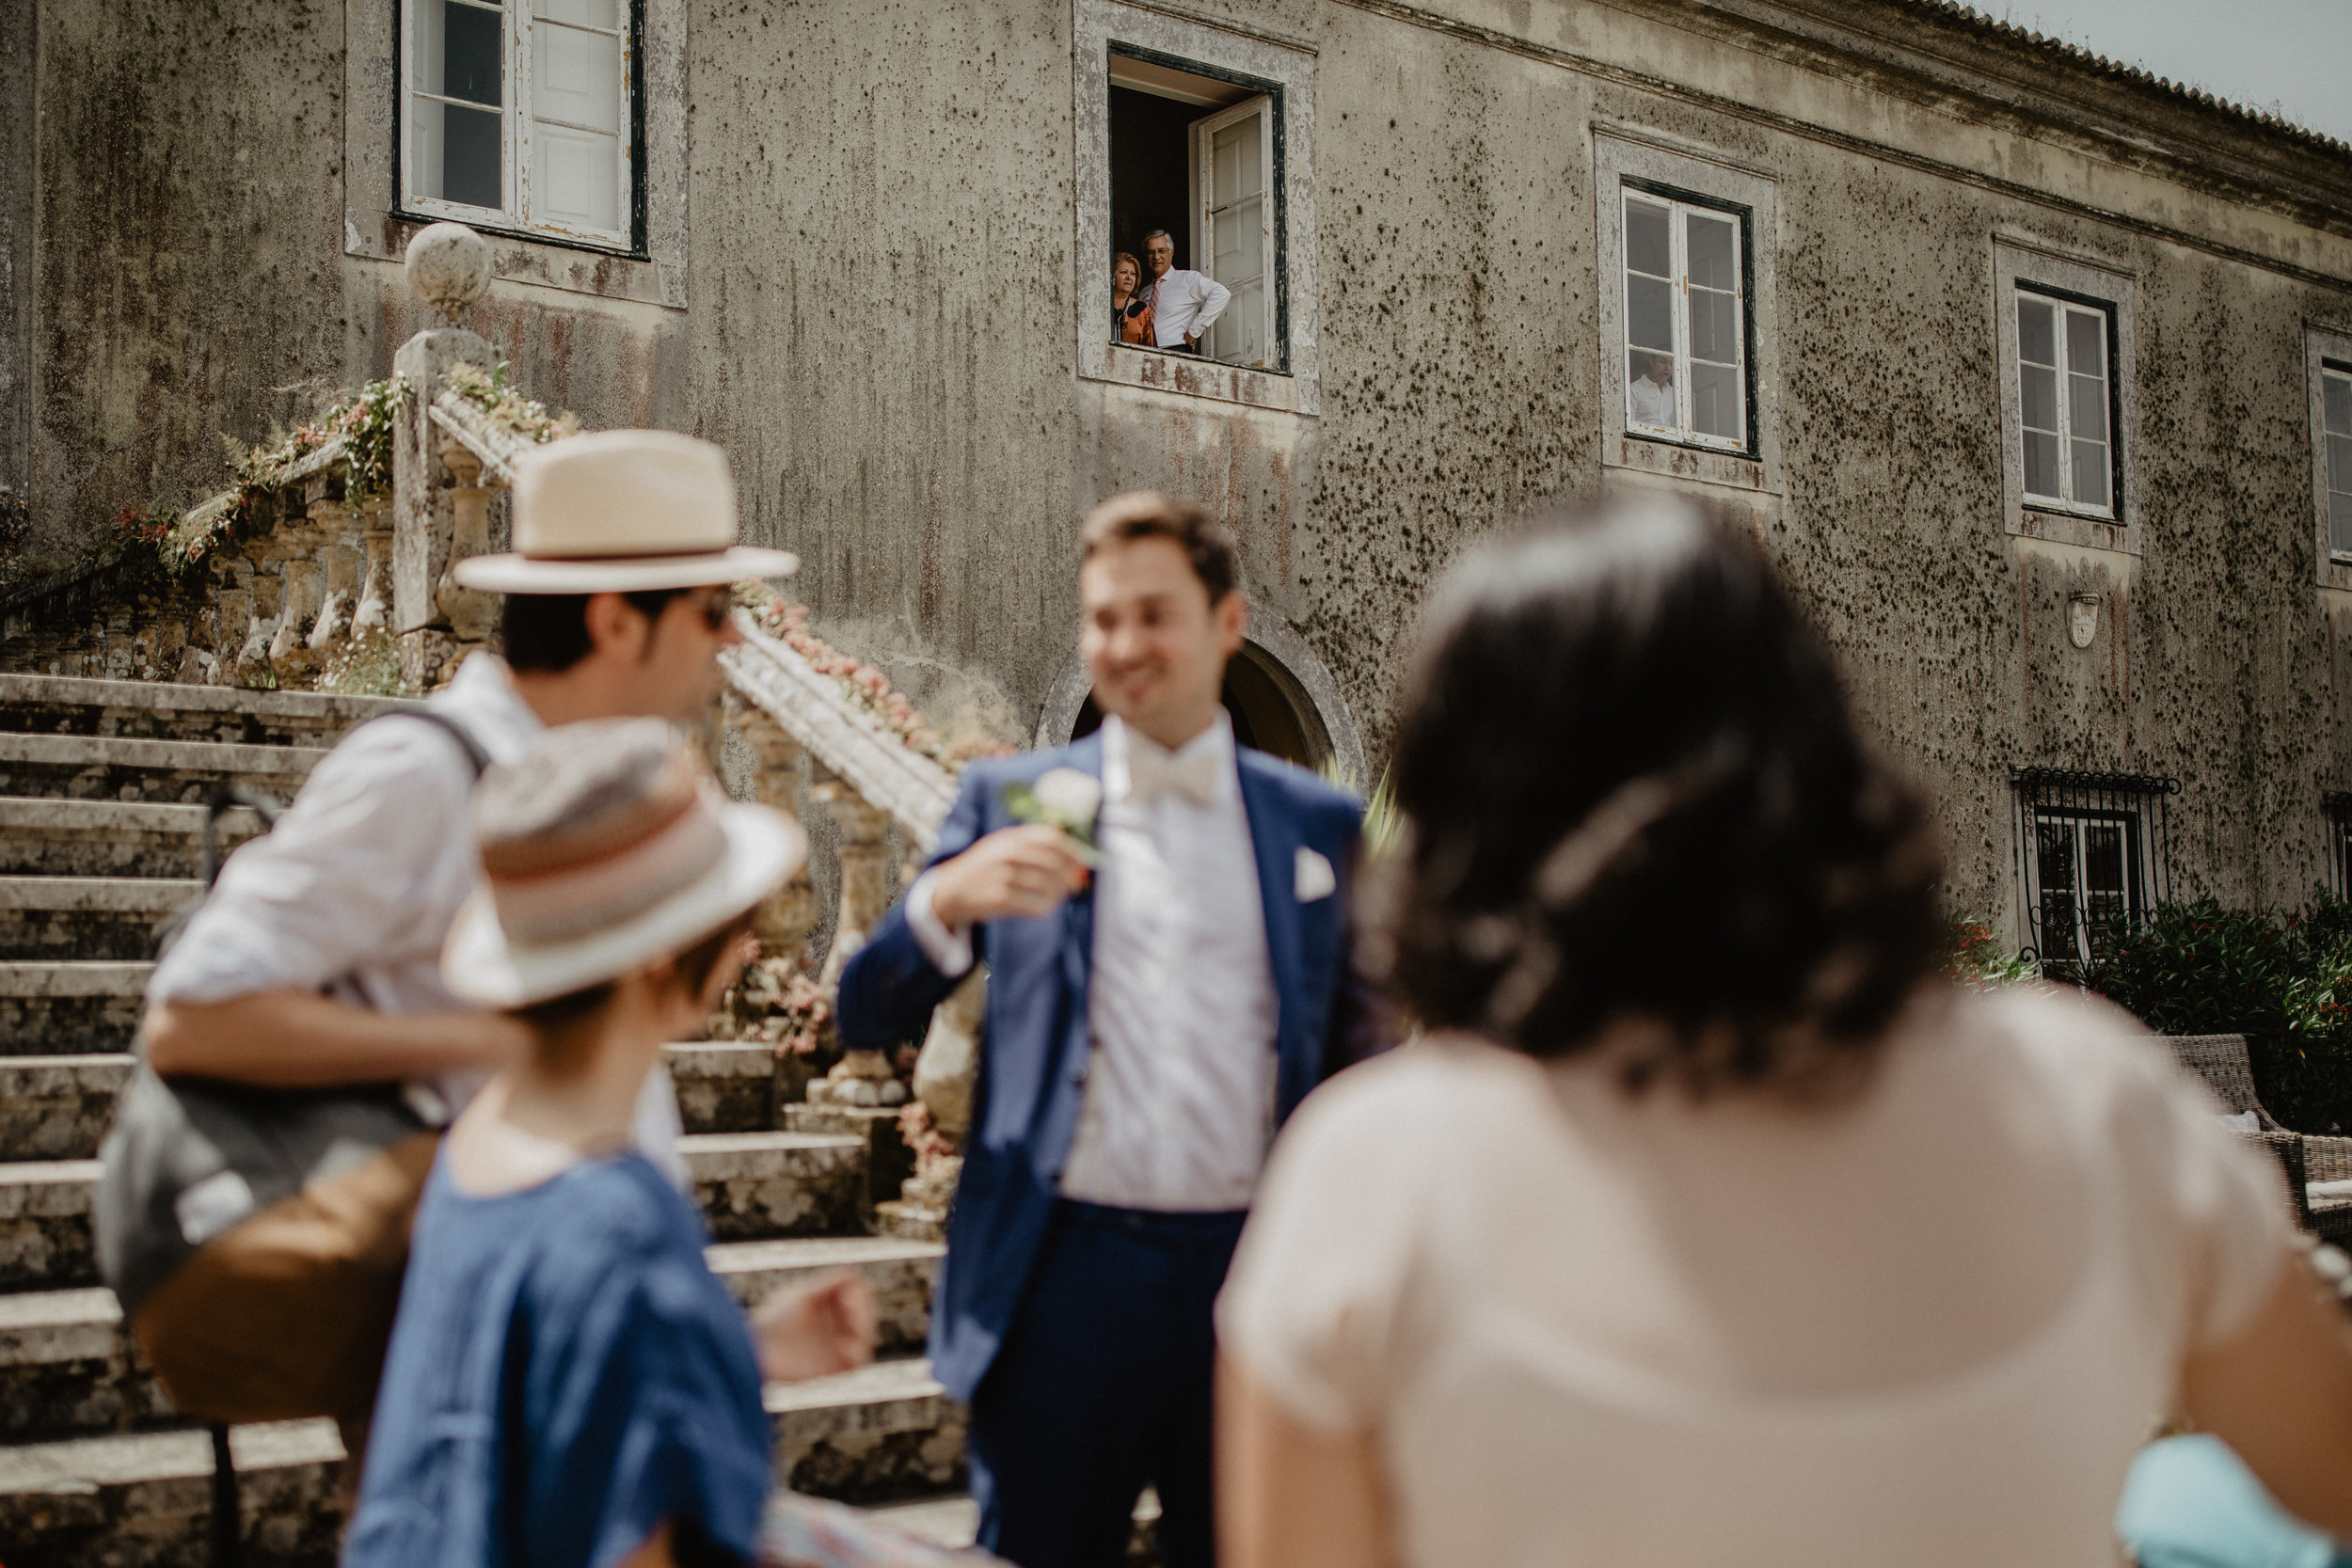 Lapela-photography-wedding-sintra-portugal-28.jpg